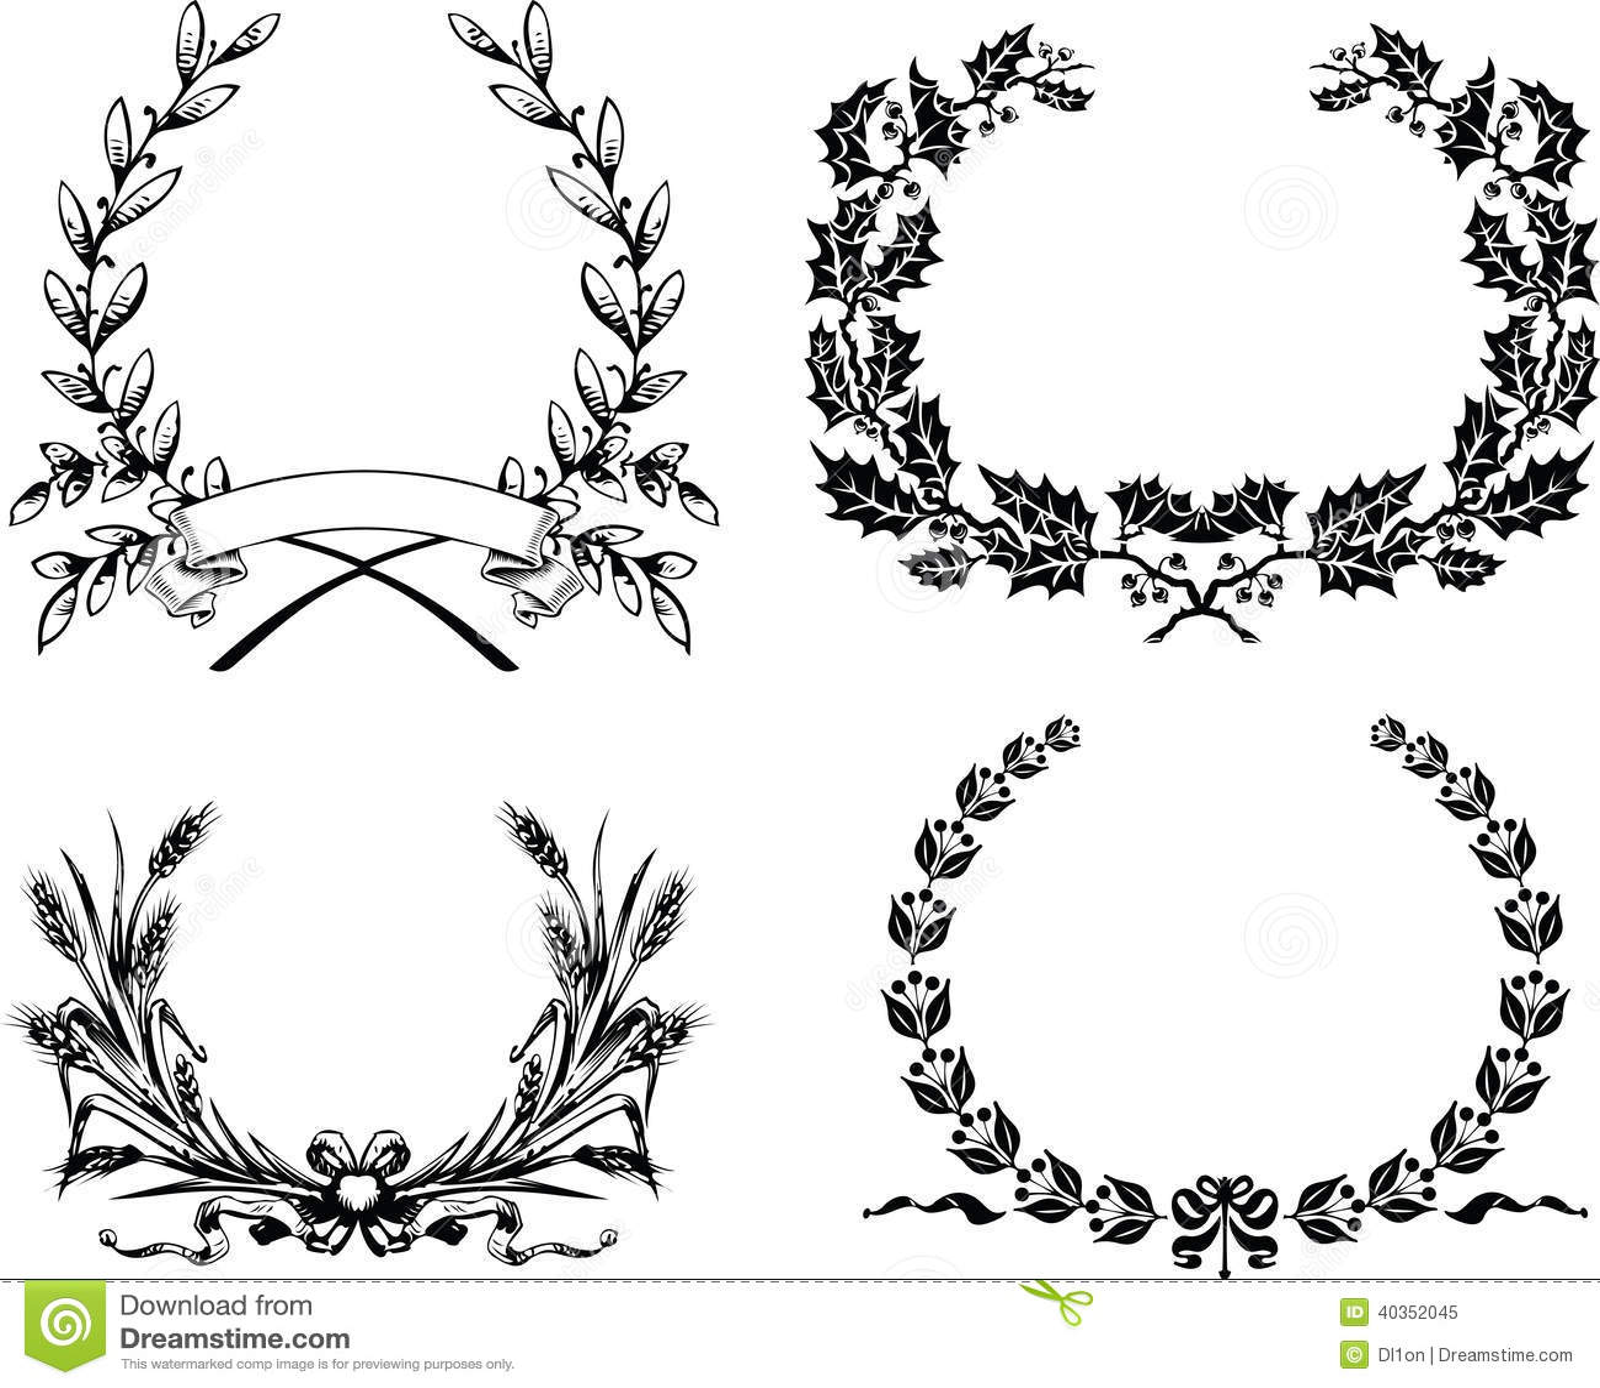 Four One Color Original Heraldic Wreath Stock Vector